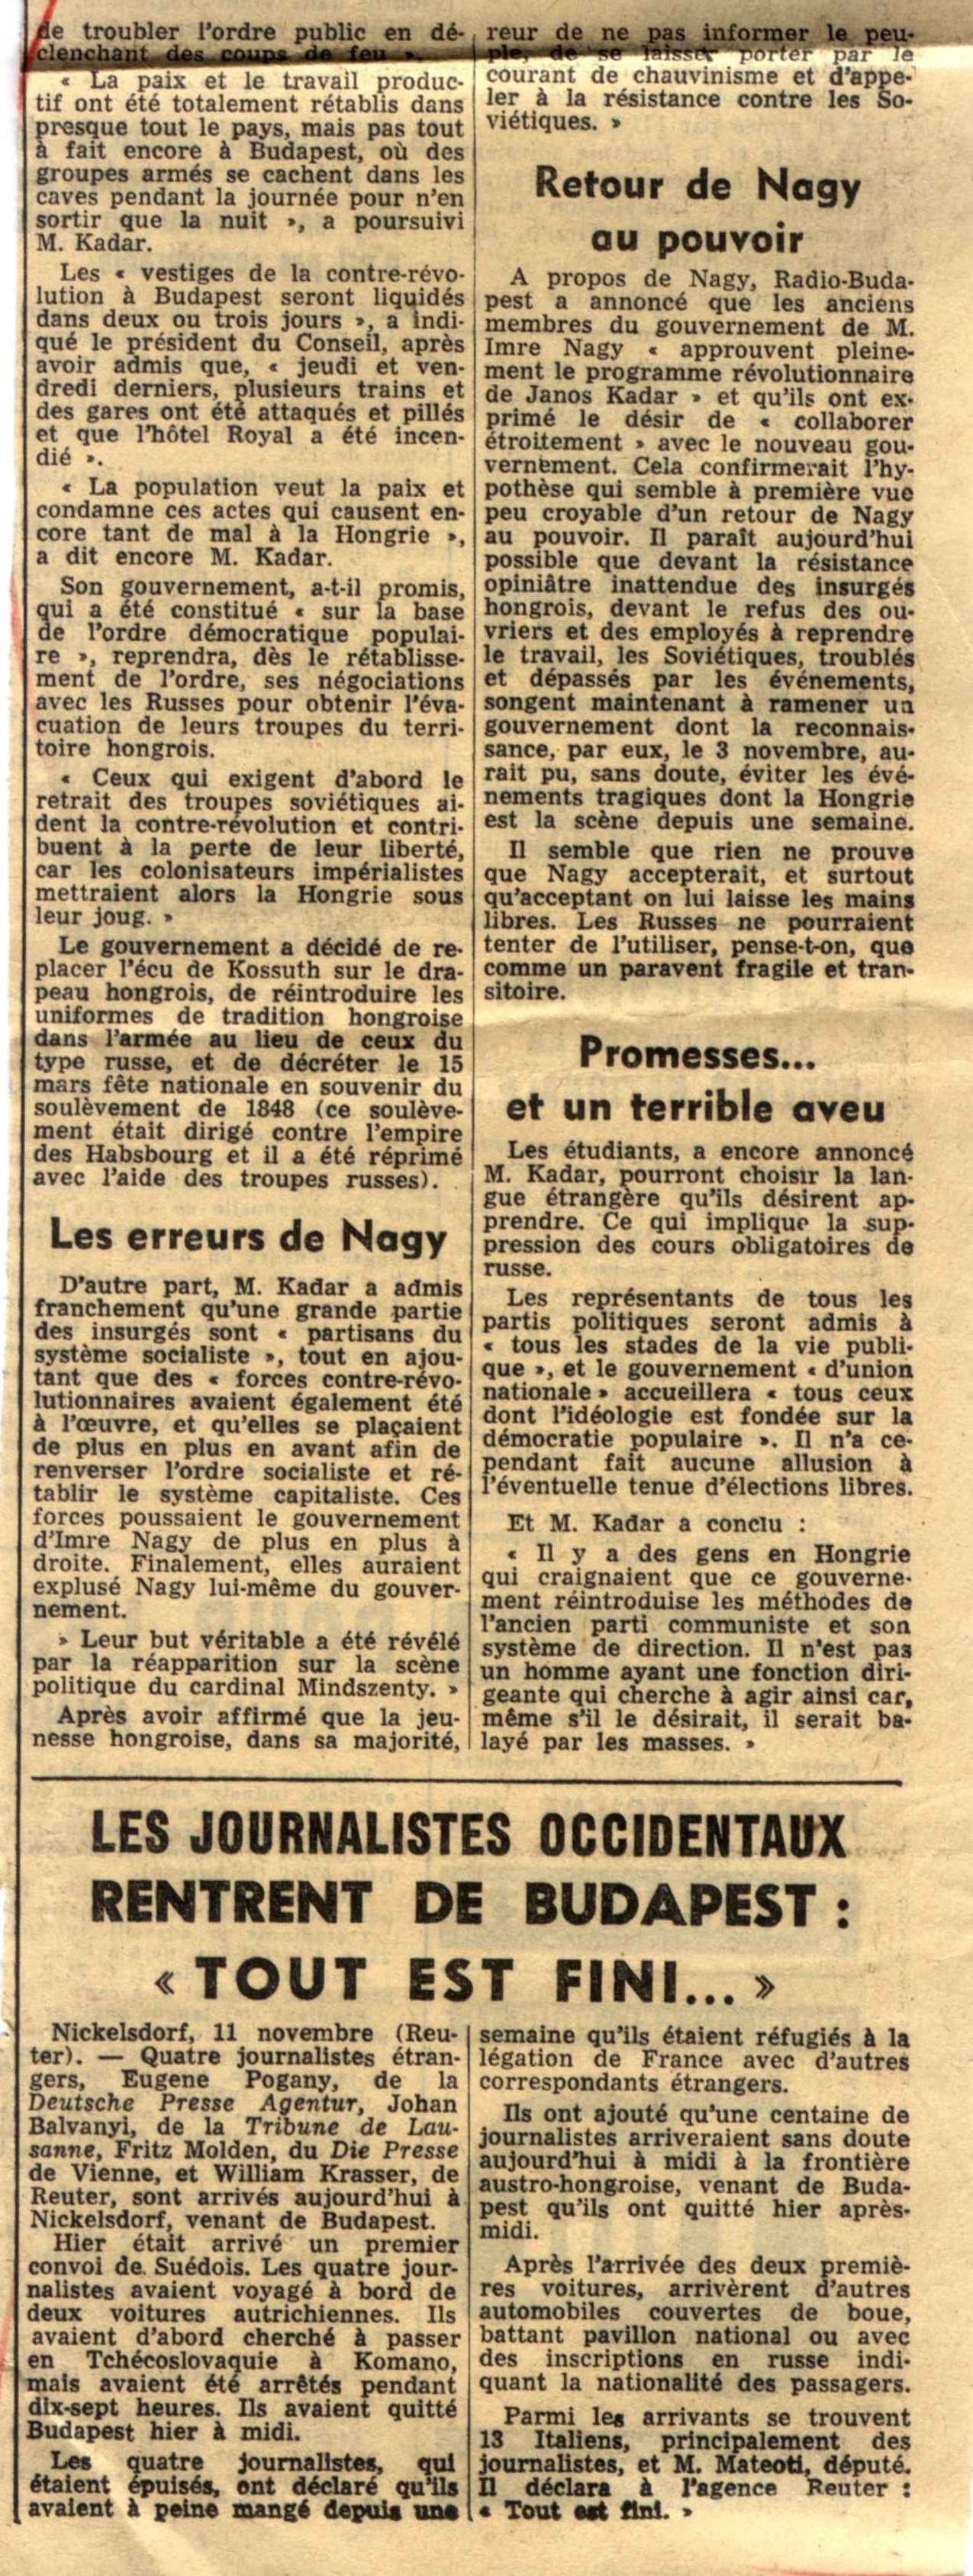 osa 1956 digital archive